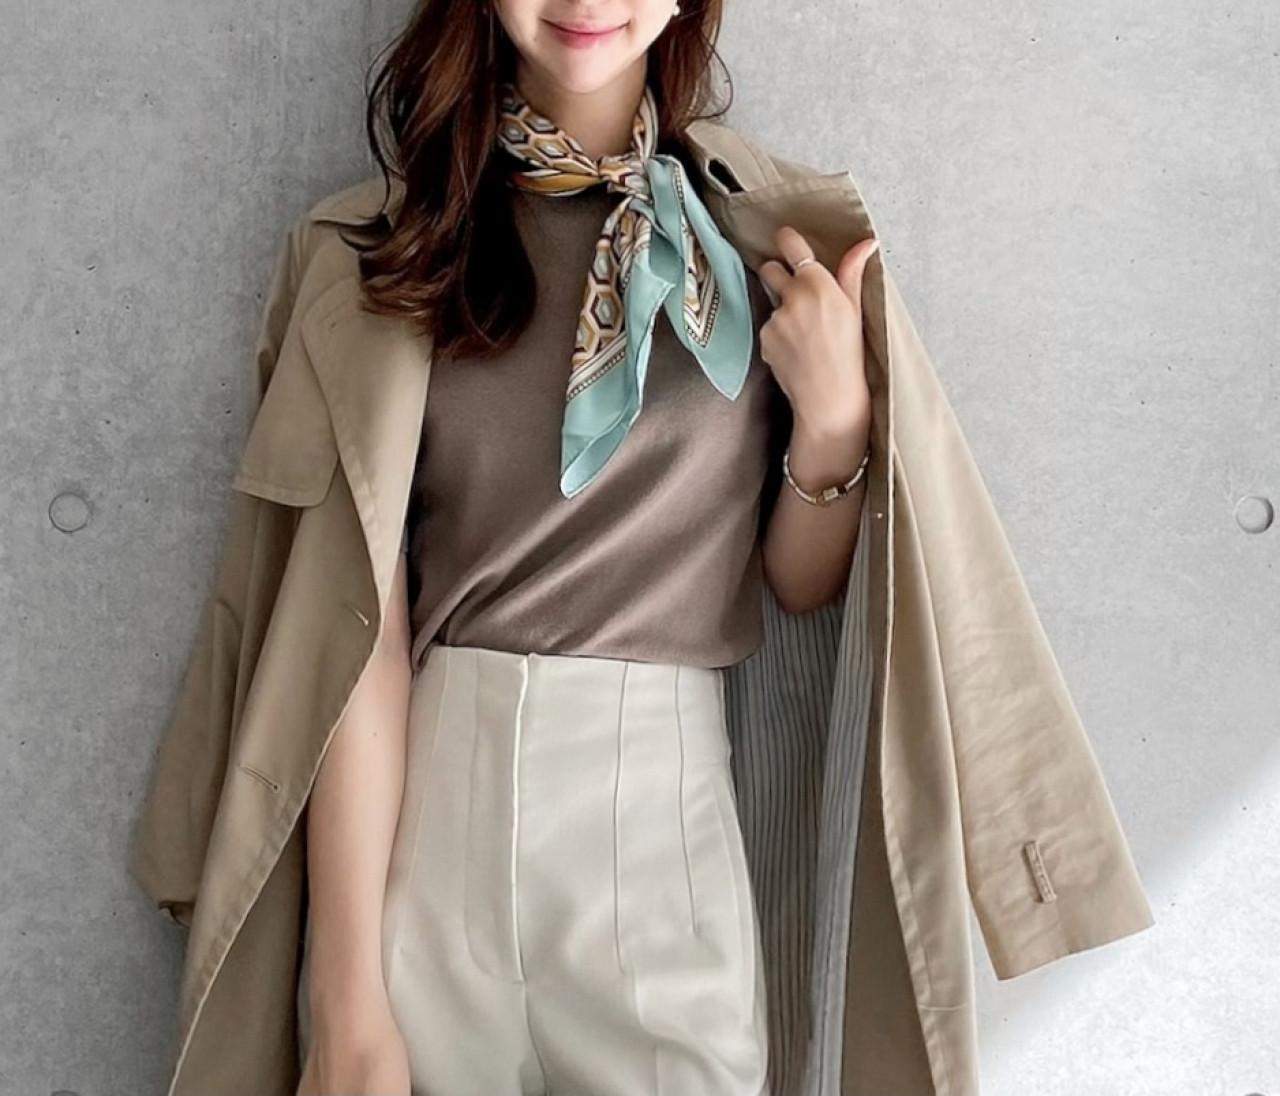 【ZARA】大人気イニシャルスカーフ♡マンネリ打破する3つの使い方